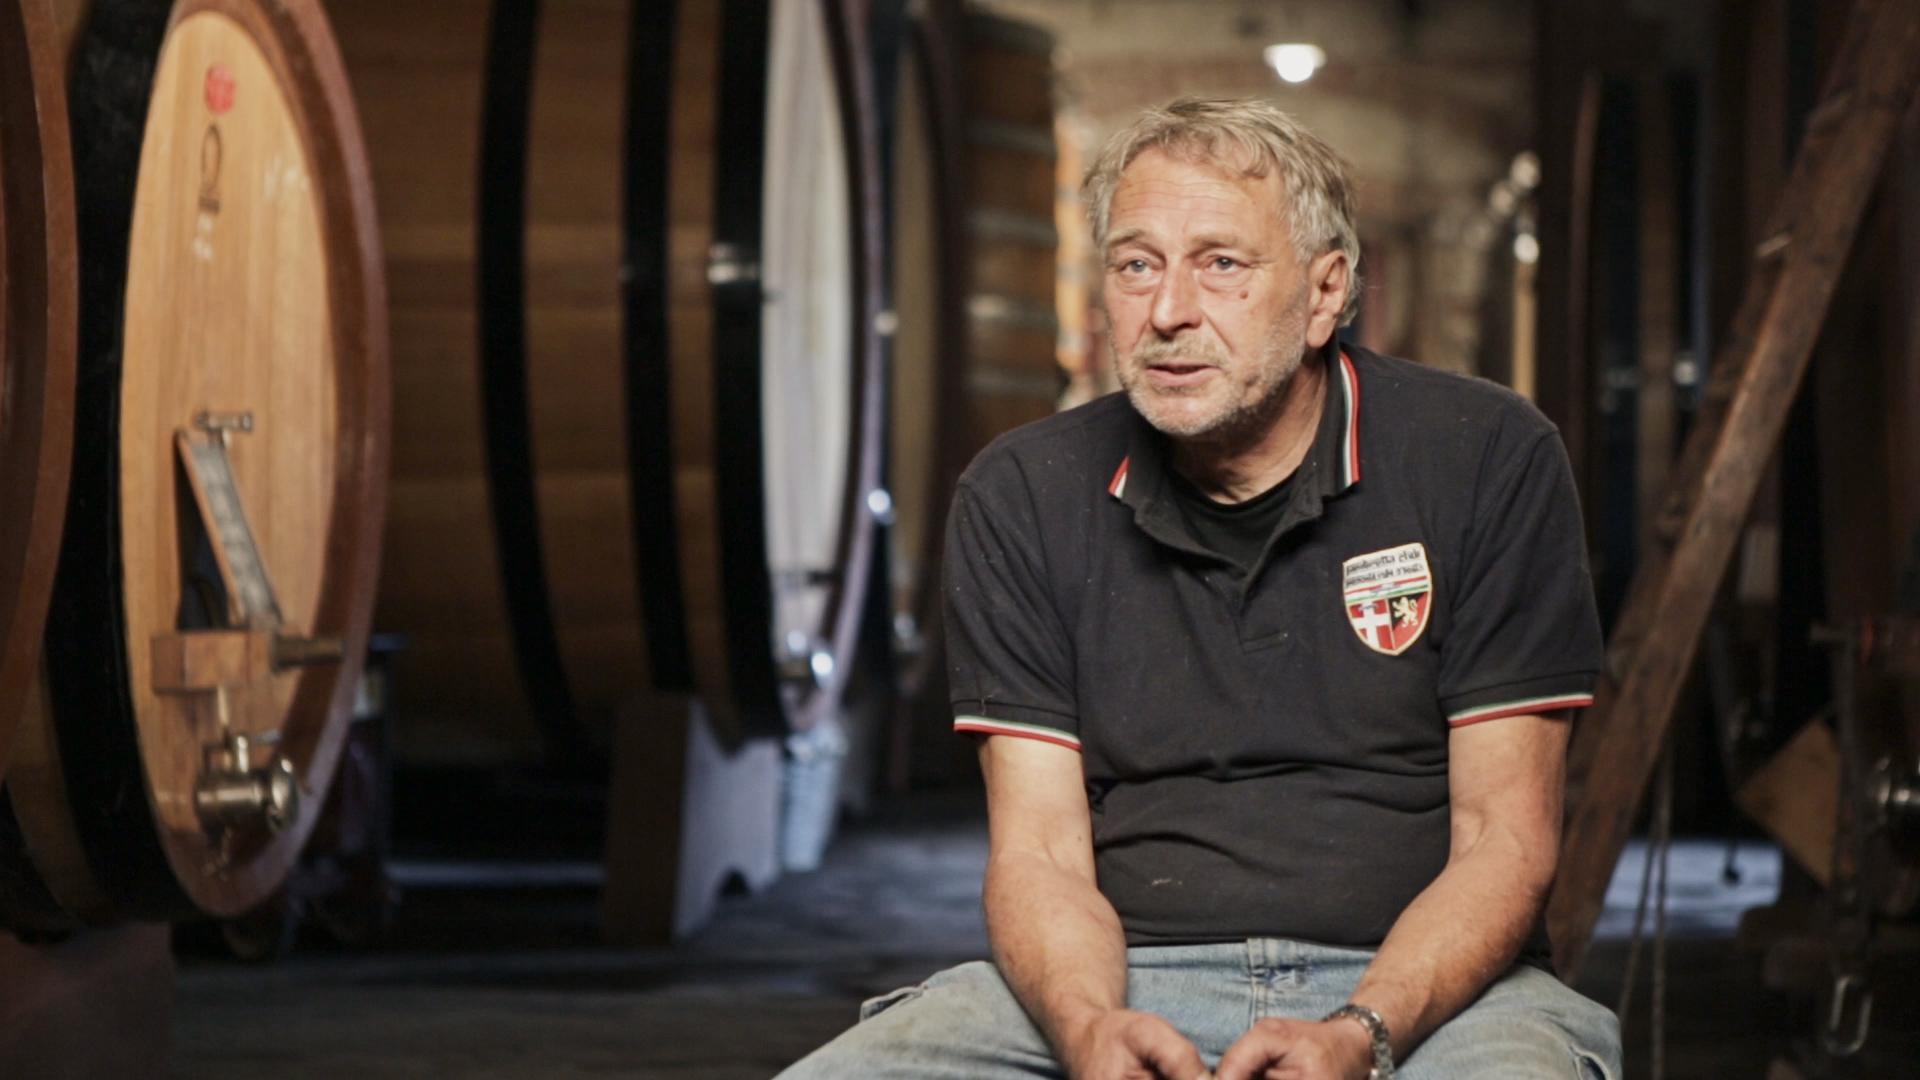 Barolism Giuseppe Rinaldi Barolo